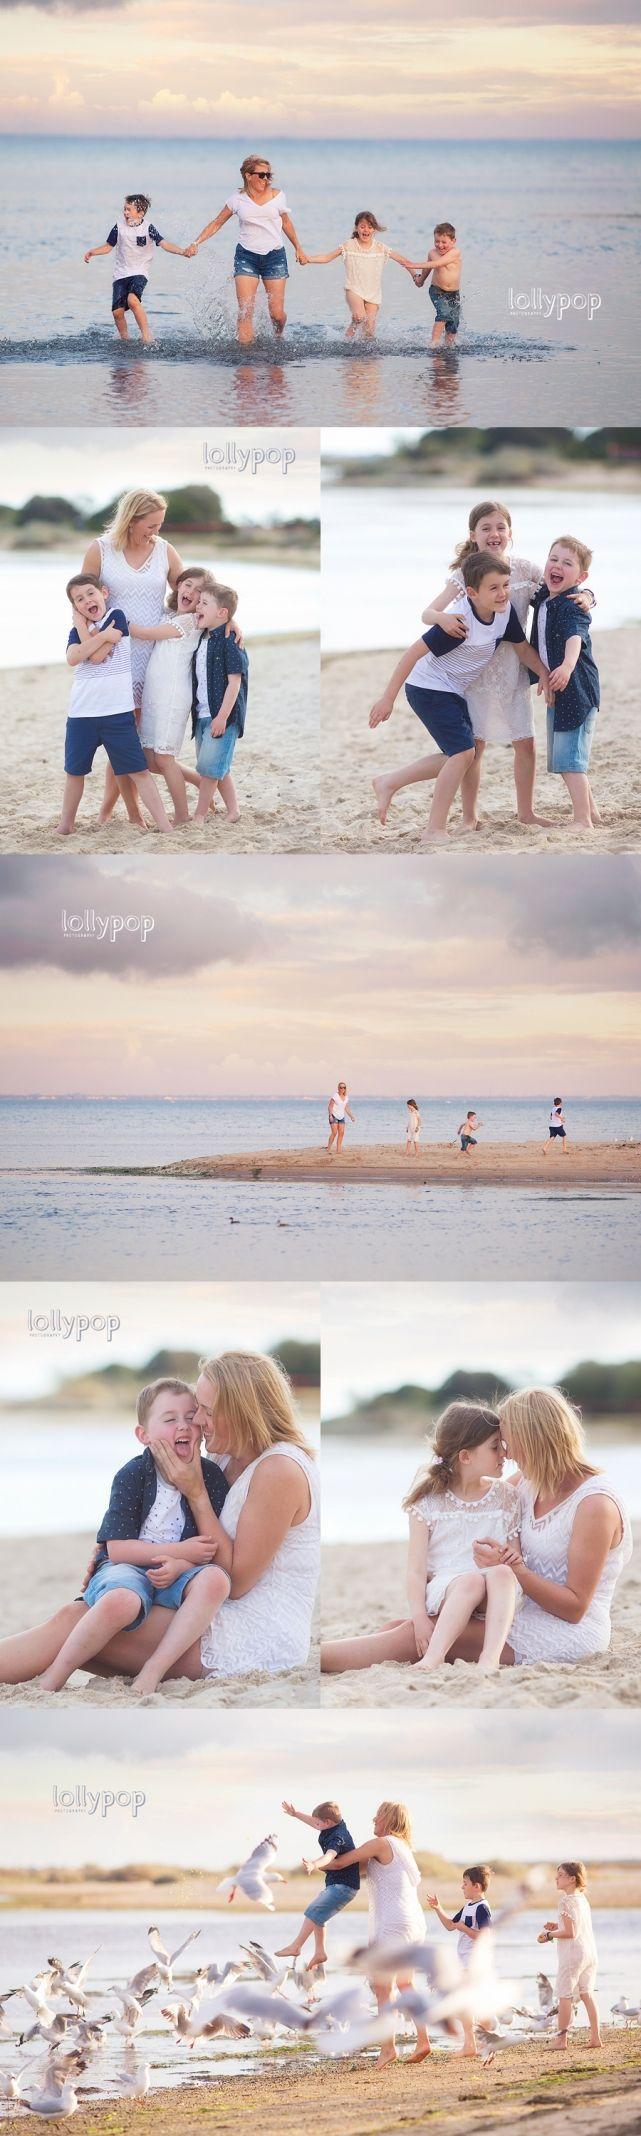 beach photography, Melbourne photographer